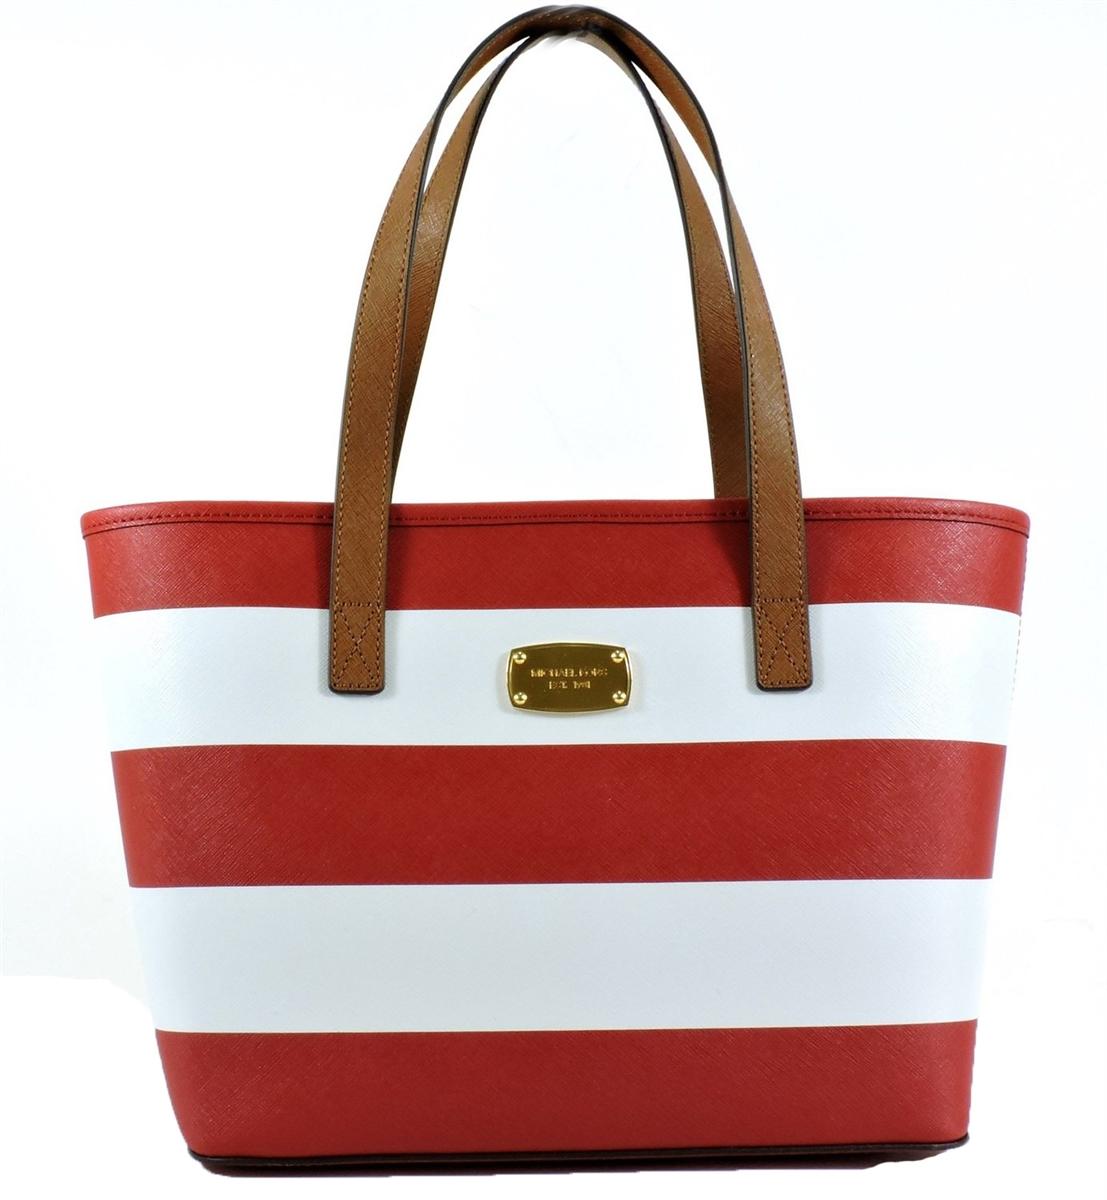 4281206d8854 Buy michael kors handbags jet set tote   OFF39% Discounted